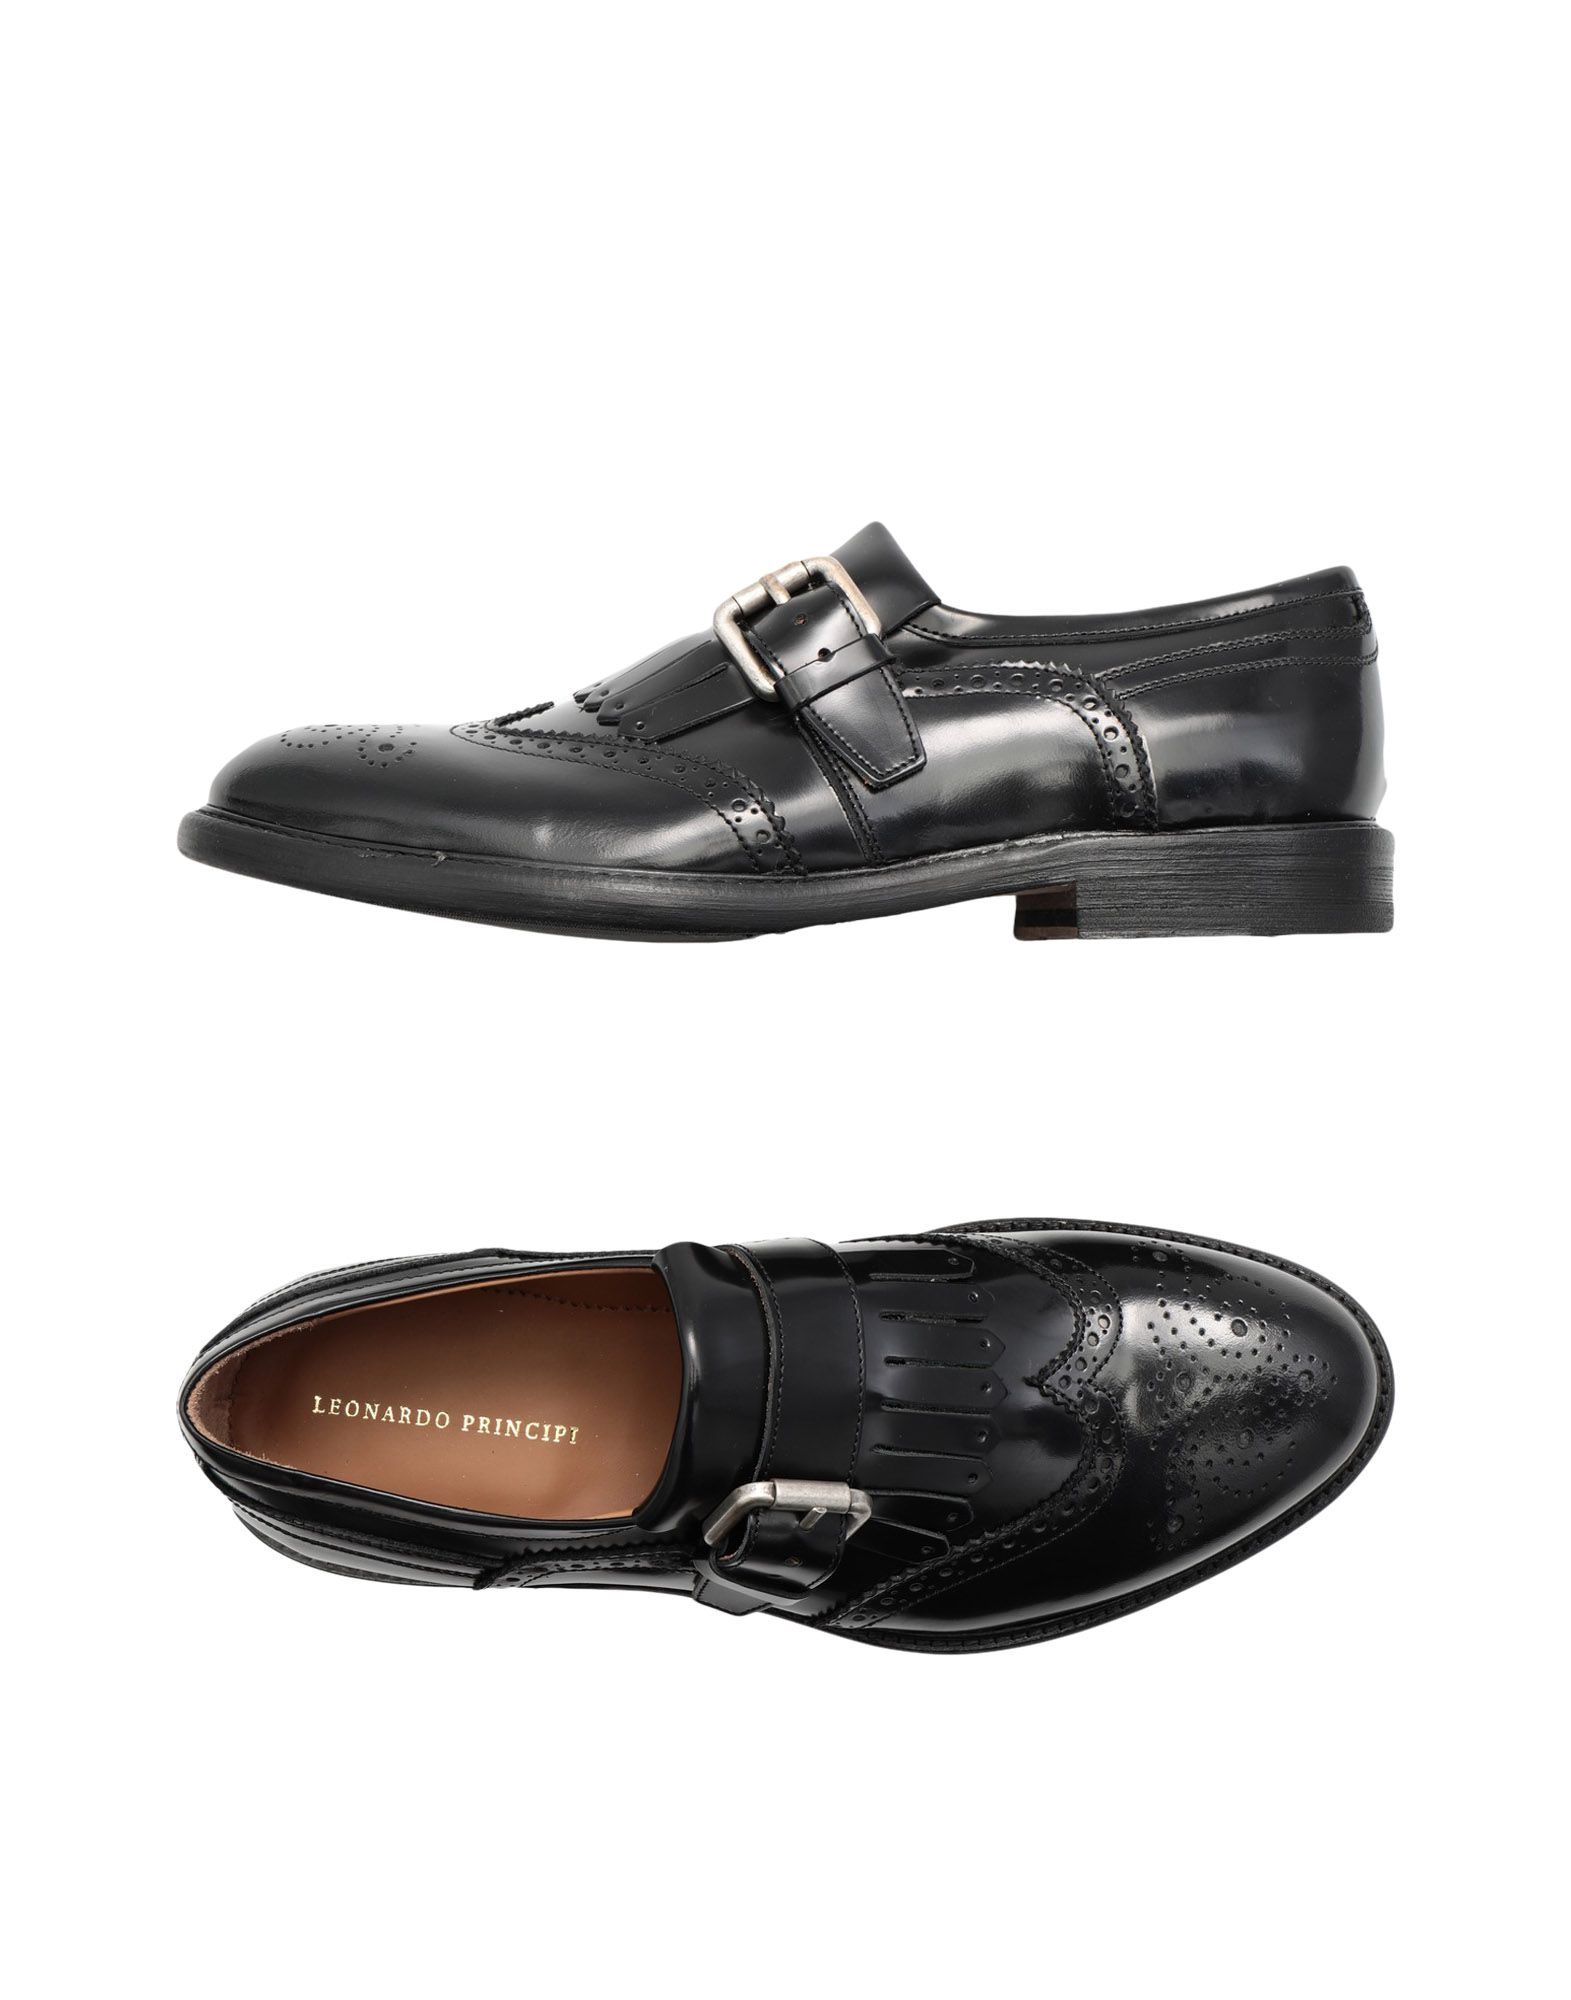 Leonardo Principi Mokassins Herren  11524320AC Gute Qualität beliebte Schuhe